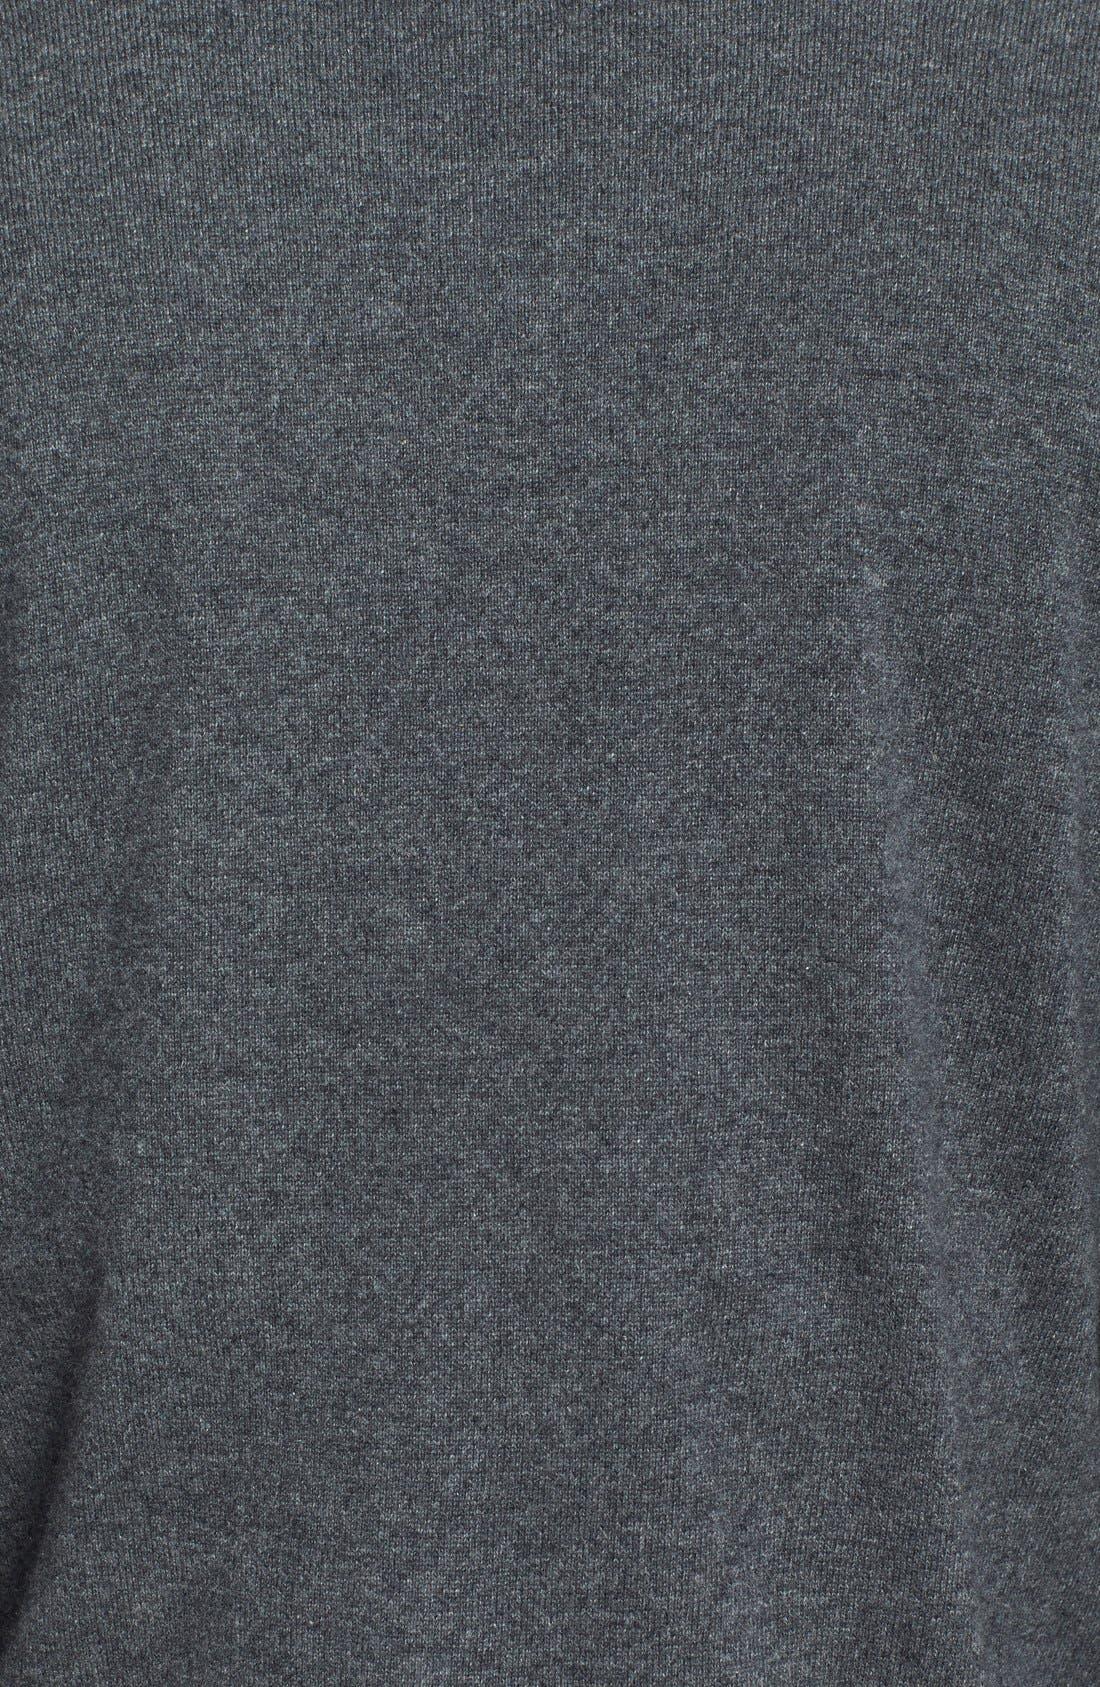 Cashmere V-Neck Sweater,                             Alternate thumbnail 3, color,                             022